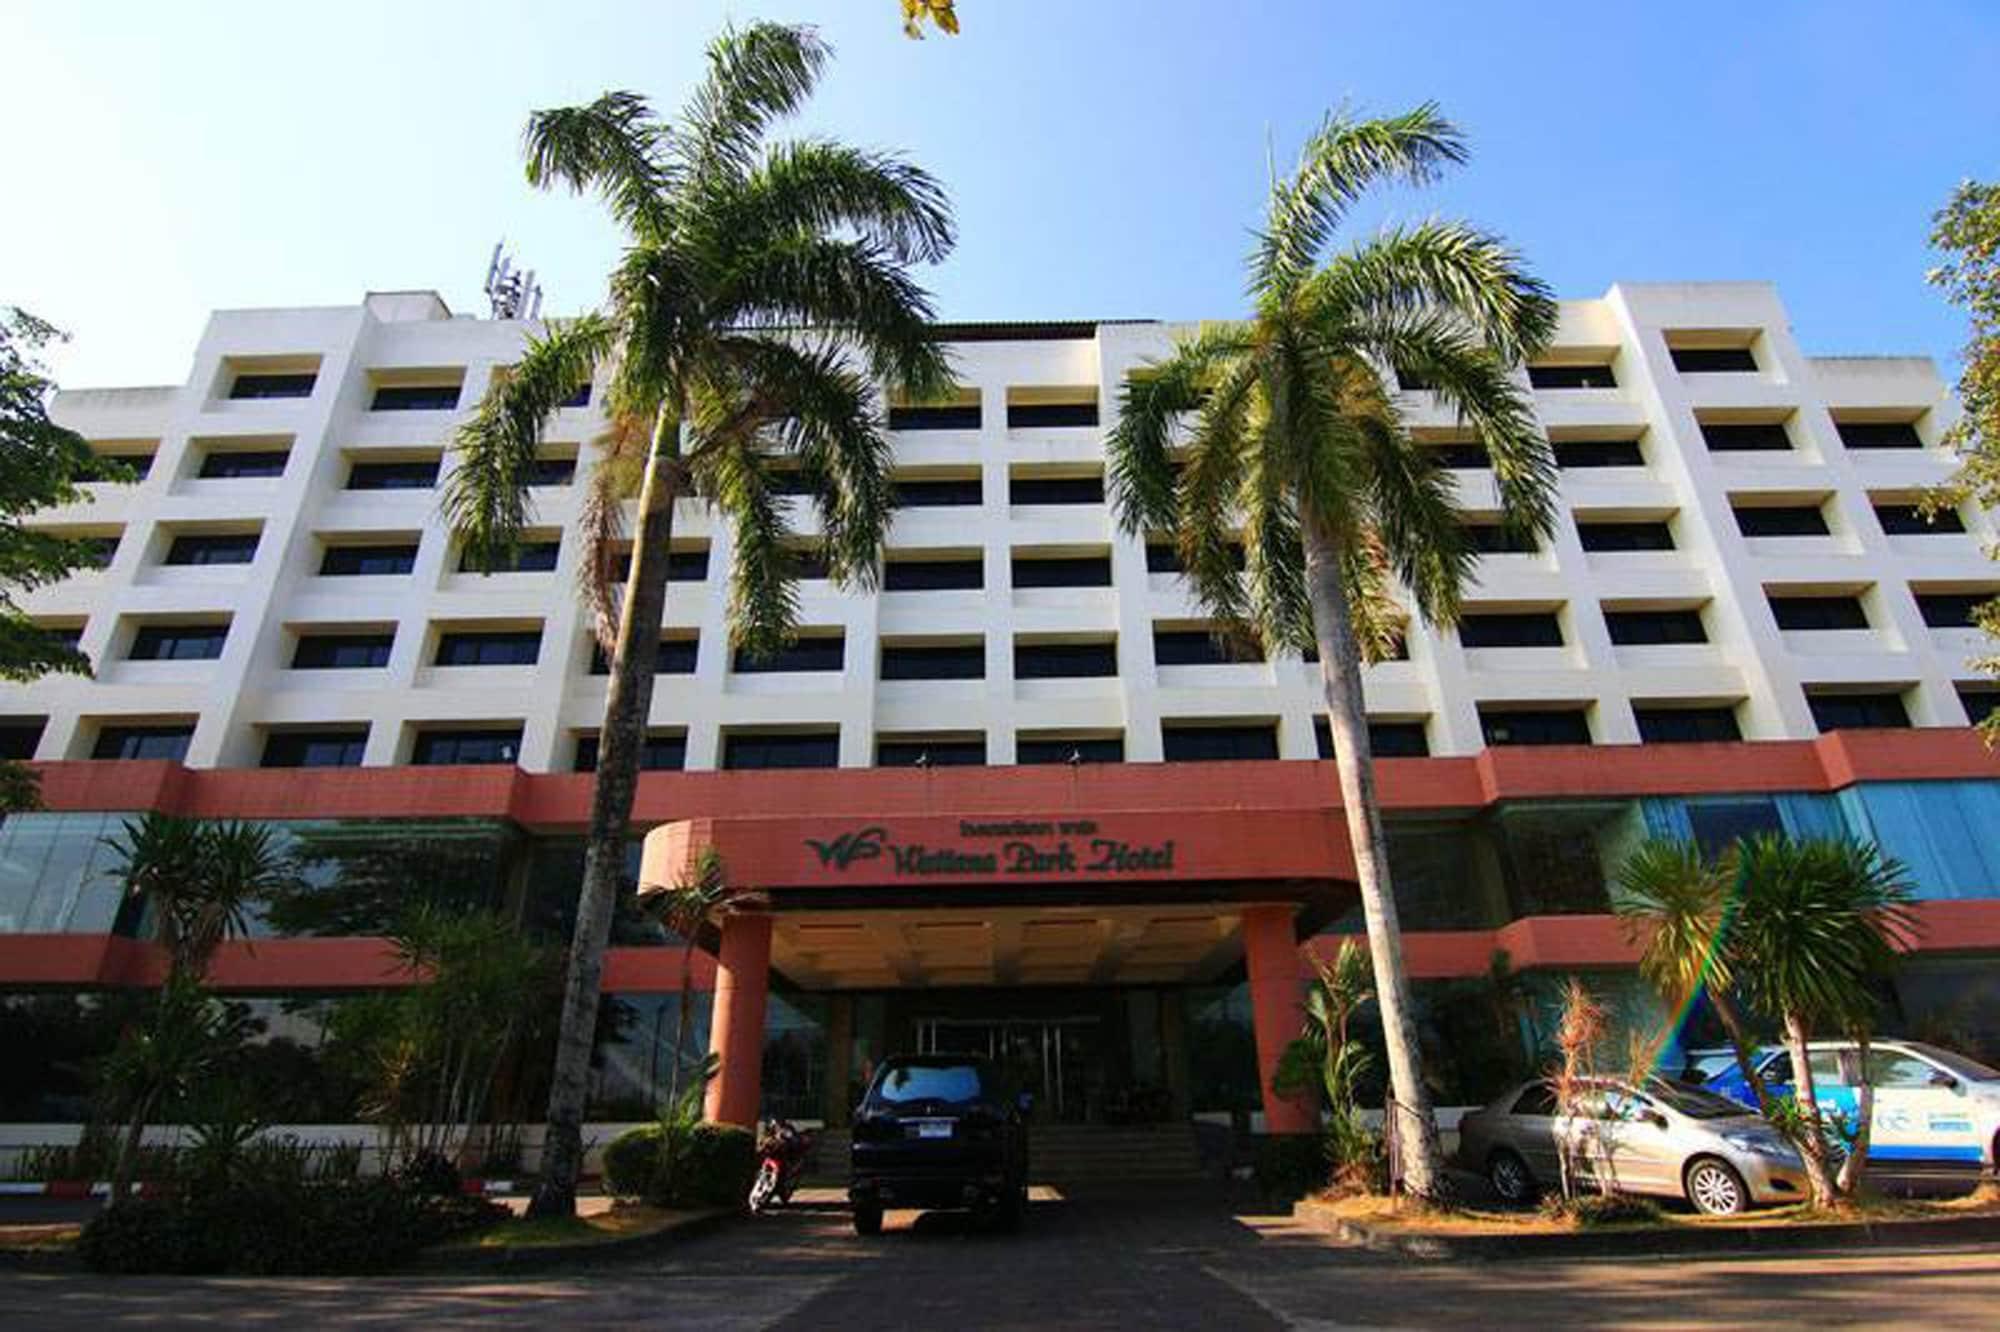 Wattana Park Hotel, Muang Trang